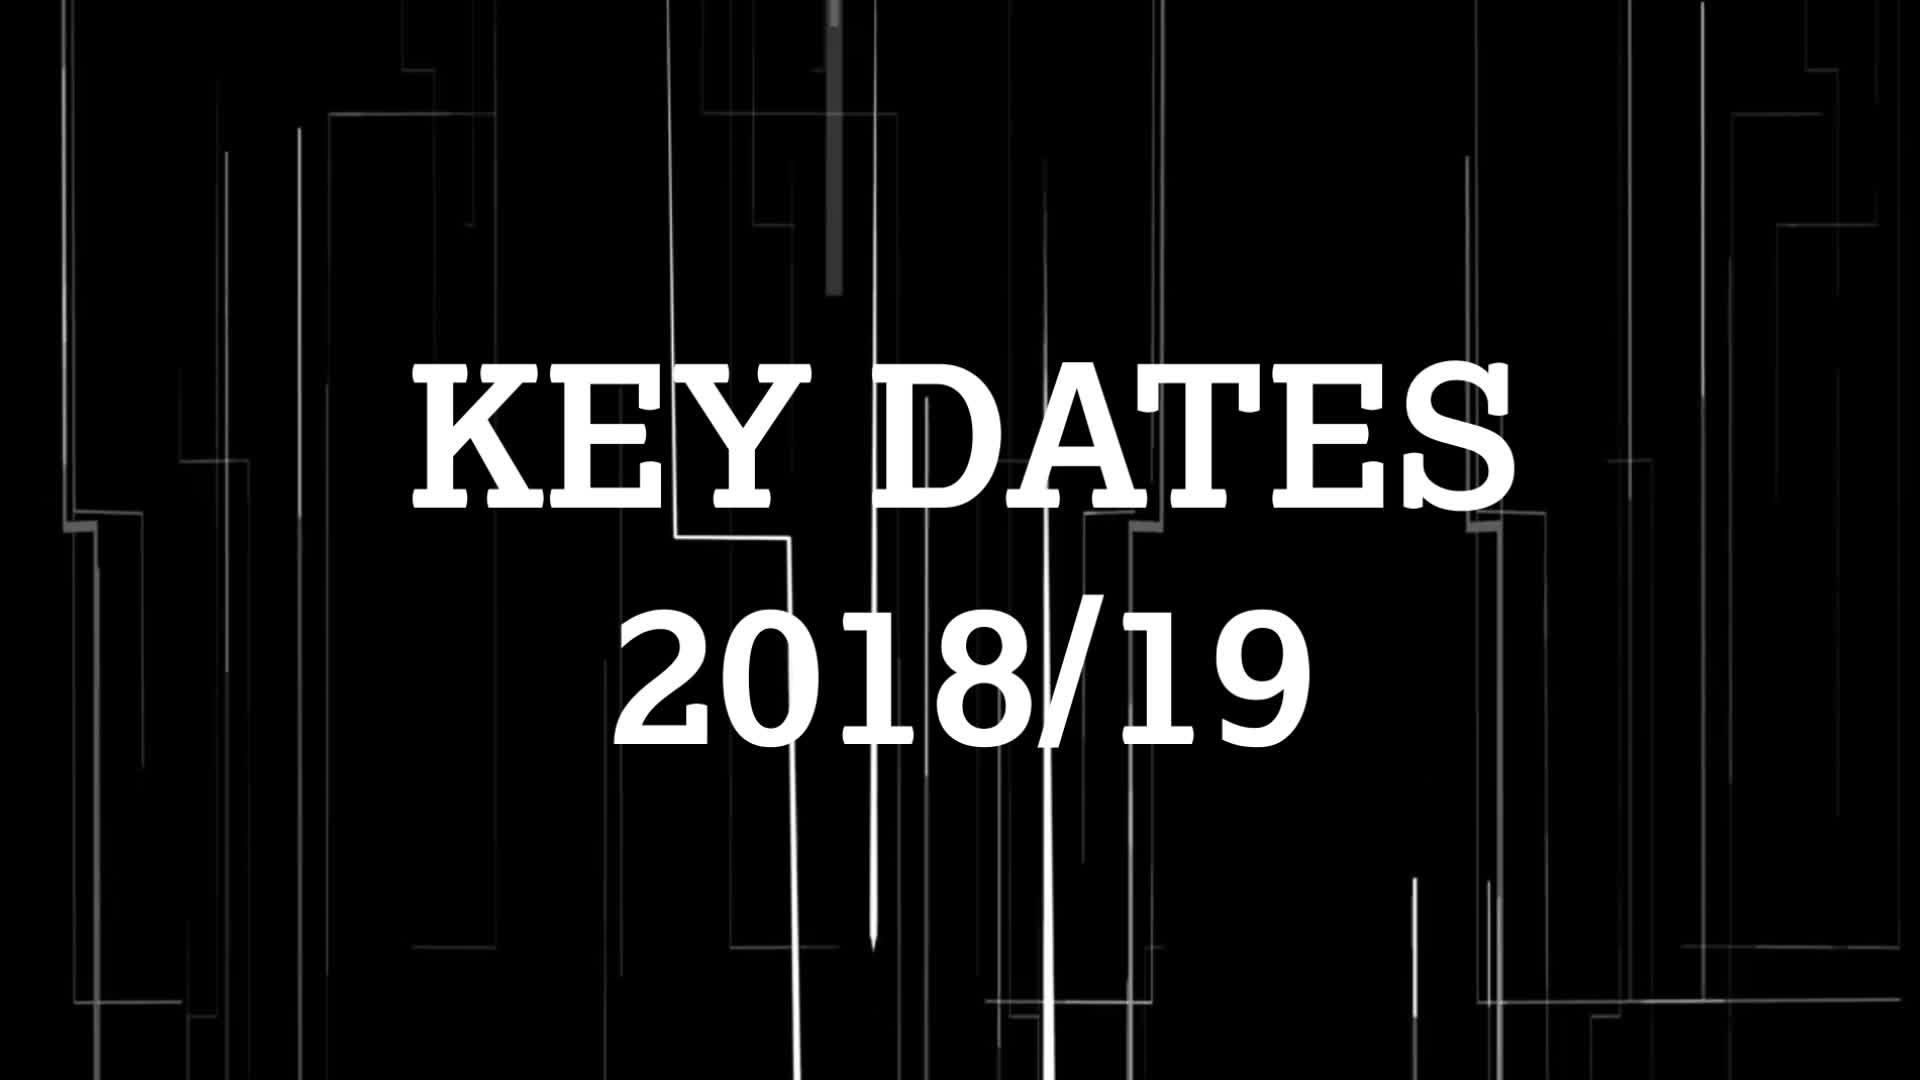 KEY DATES | Fixtures 2018/19